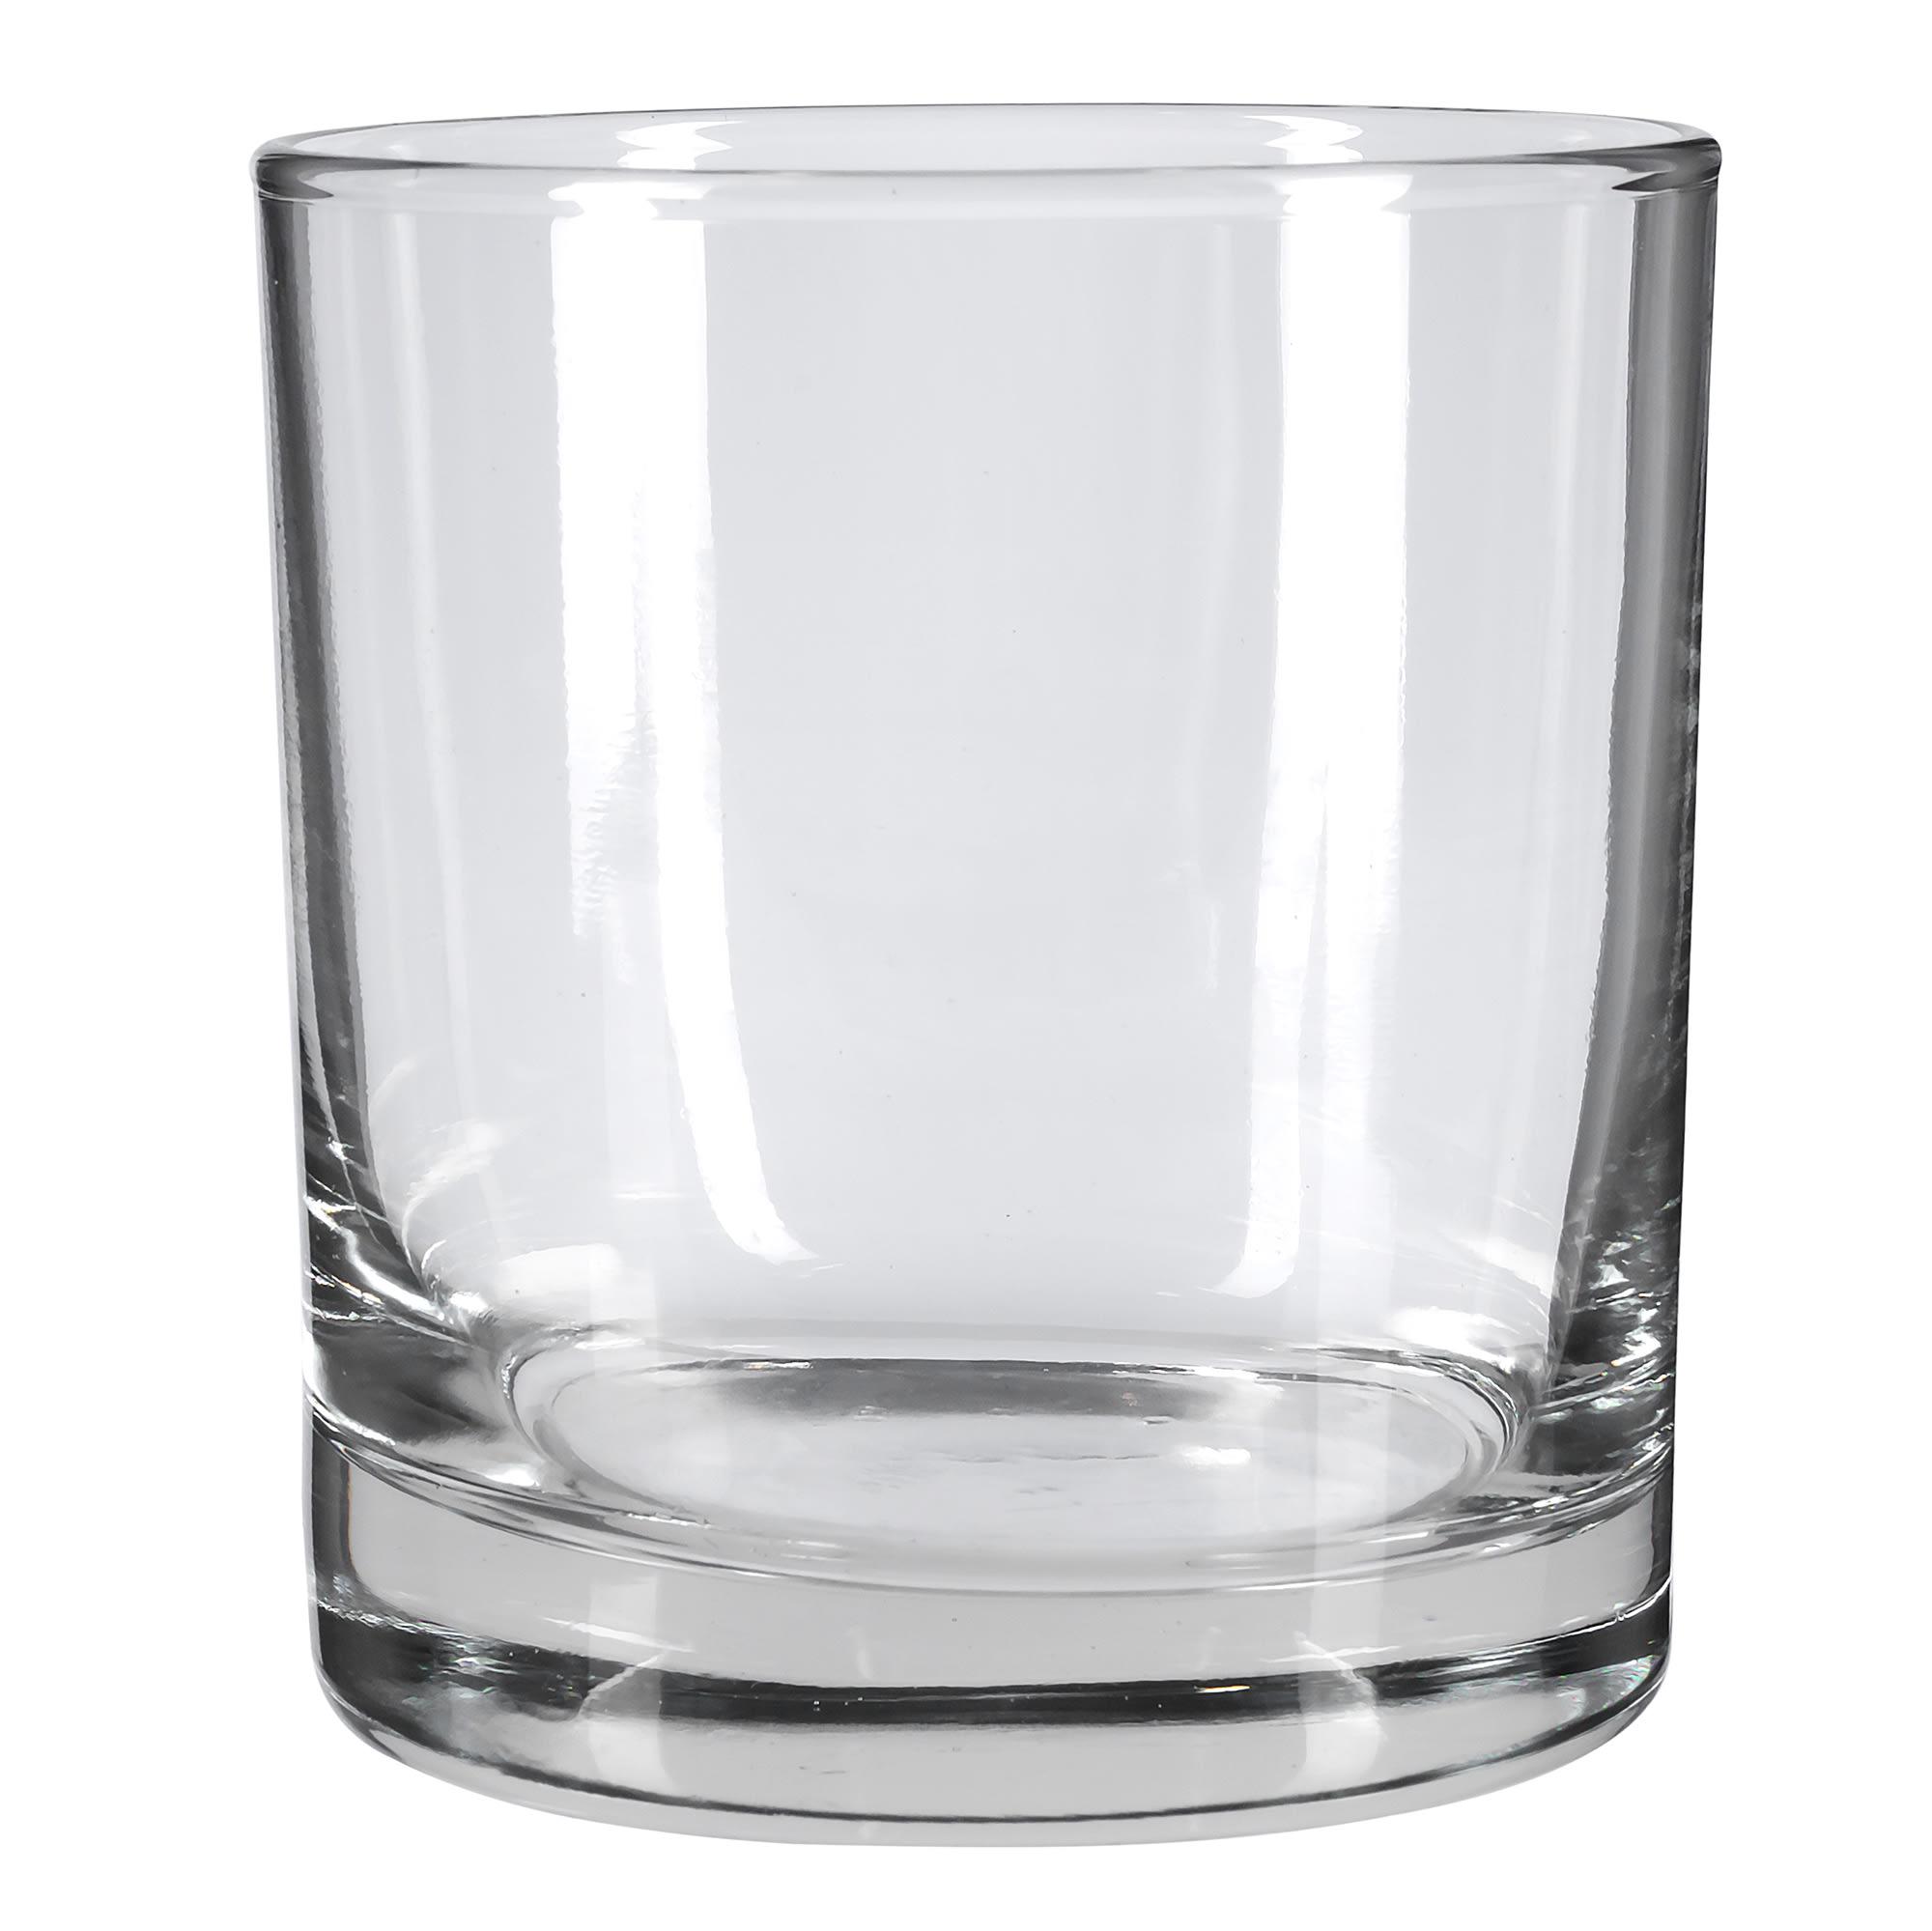 Anchor 3141U 10.5 oz Old Fashioned Glass - Concord